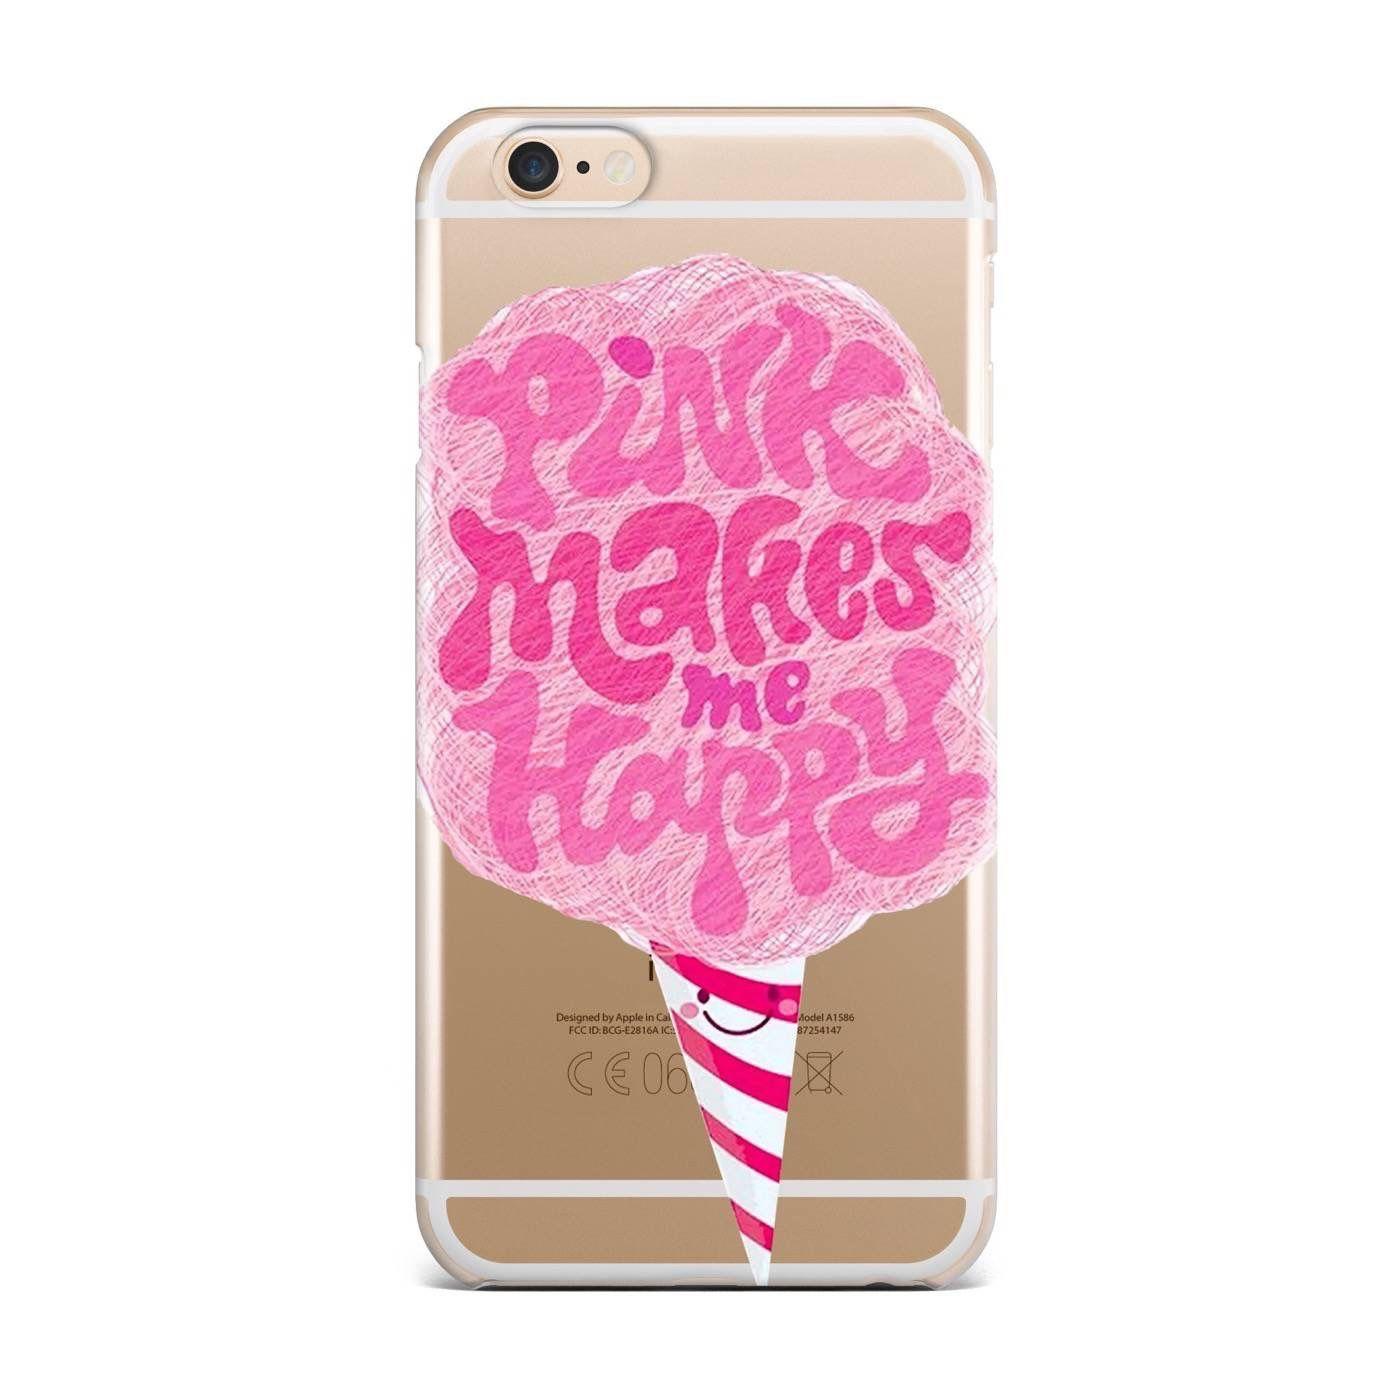 'Pink makes me happy' transparent case